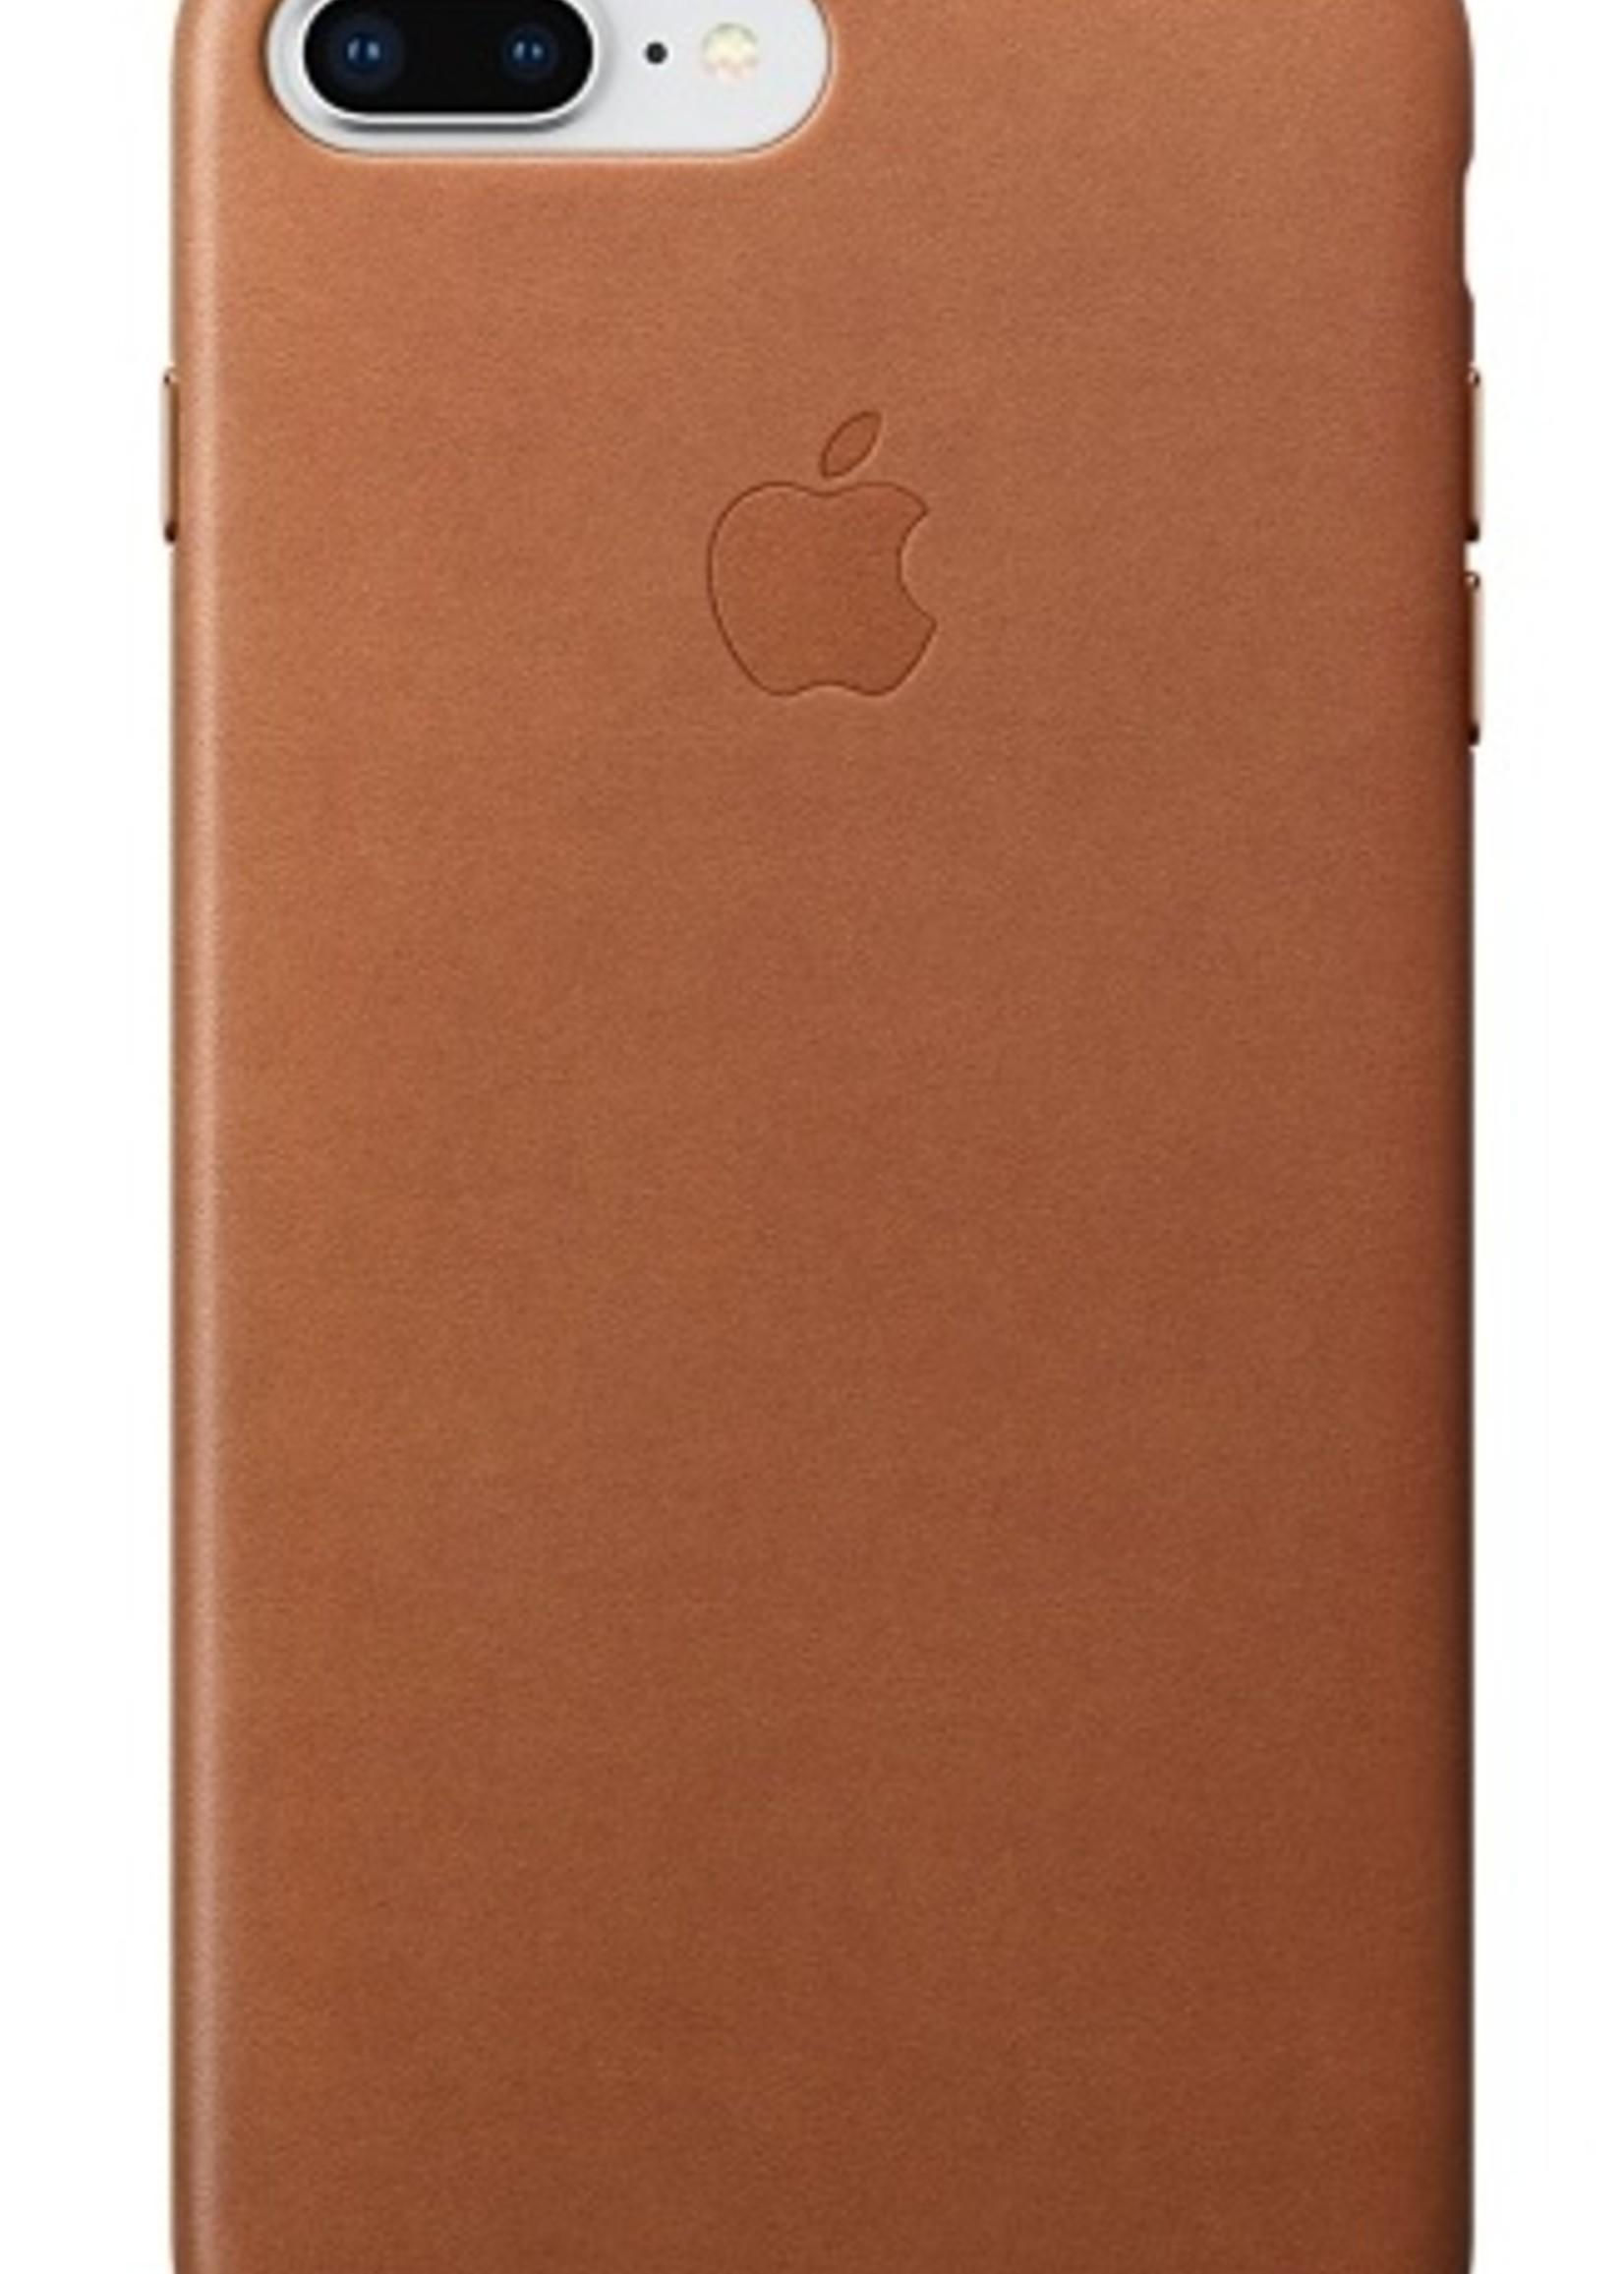 iPhone 8 Plus/7 Plus Leather Case - Saddle Brown